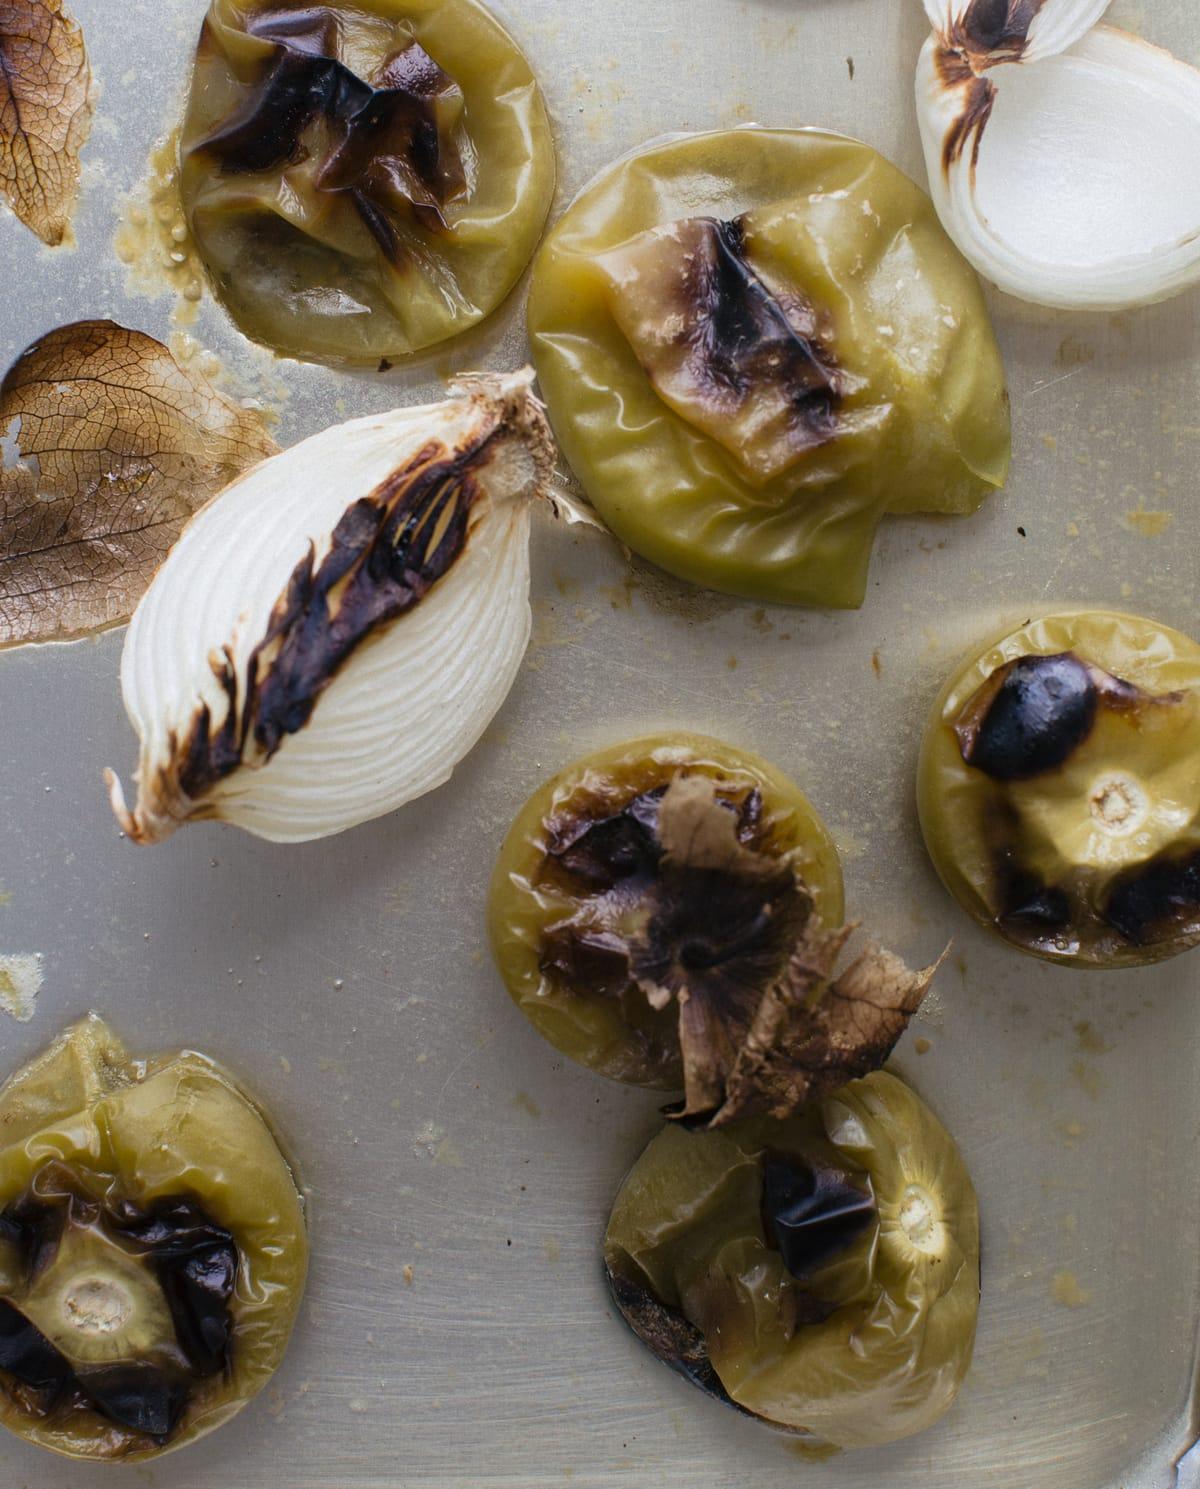 Simple Chicken Fajitas with Tomatillo Guacamole